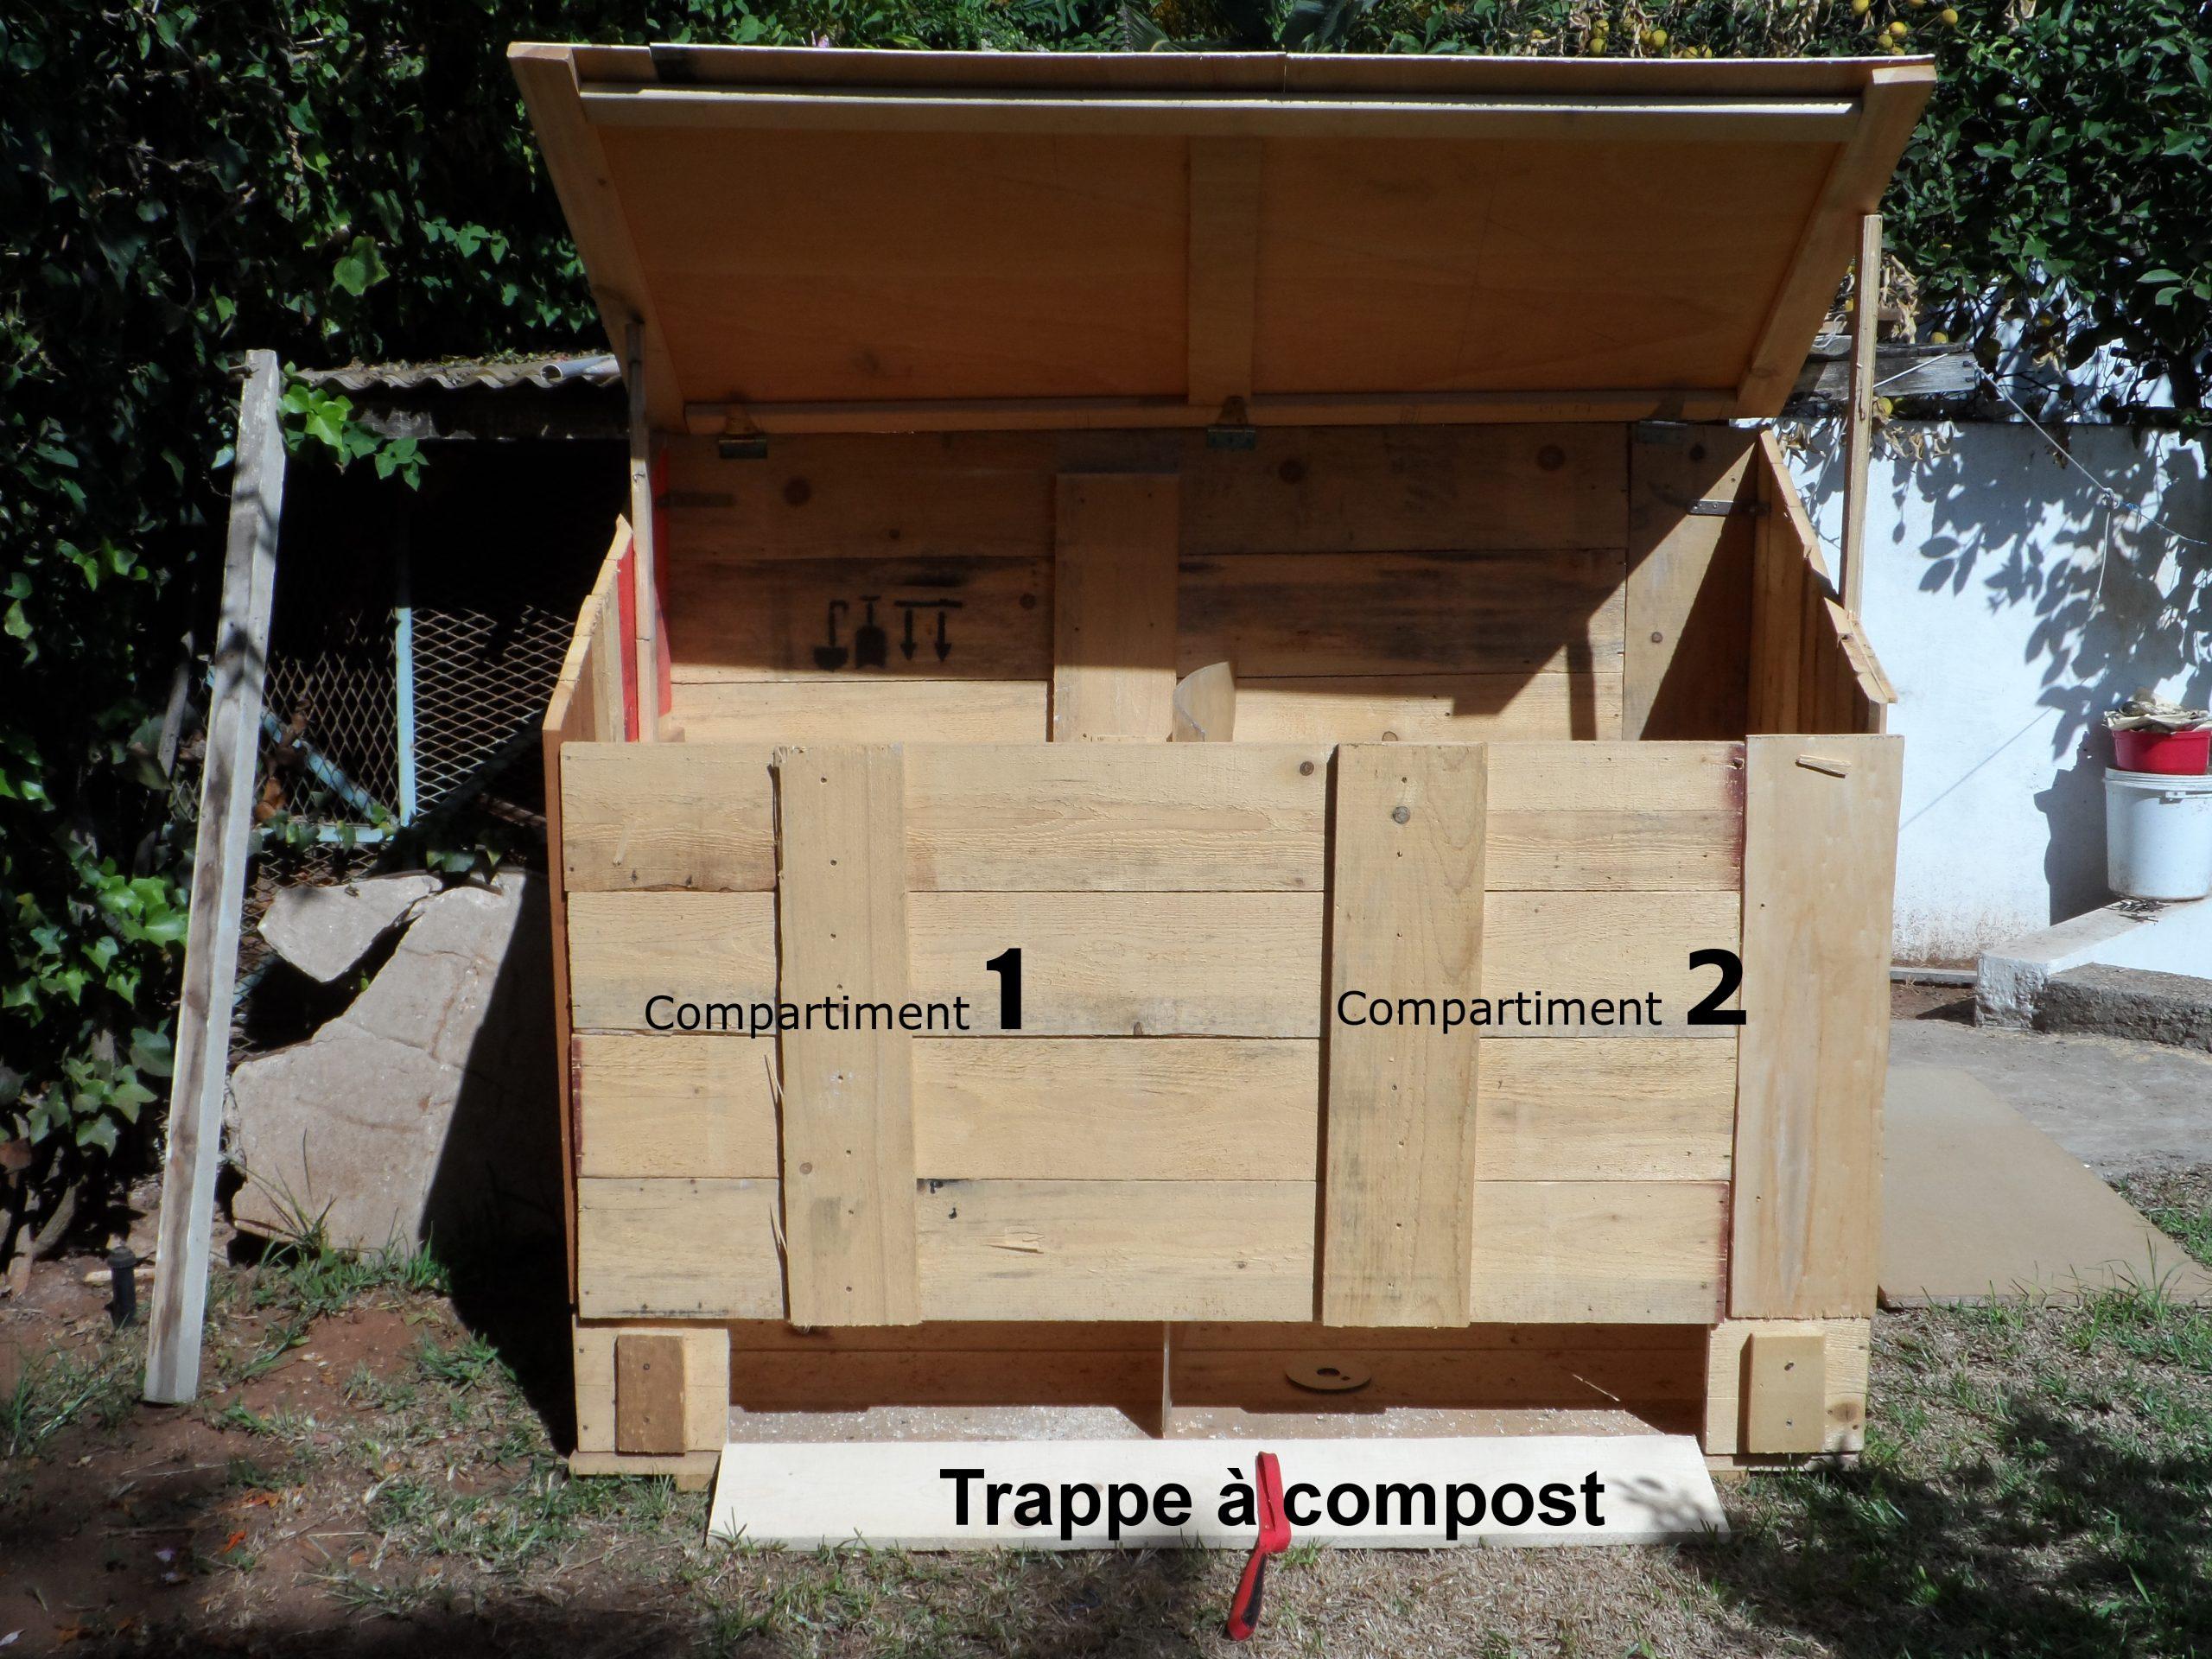 Astuces Zero Zbel – Page 2 – Zero Zbel Xperience concernant Composteur De Jardin